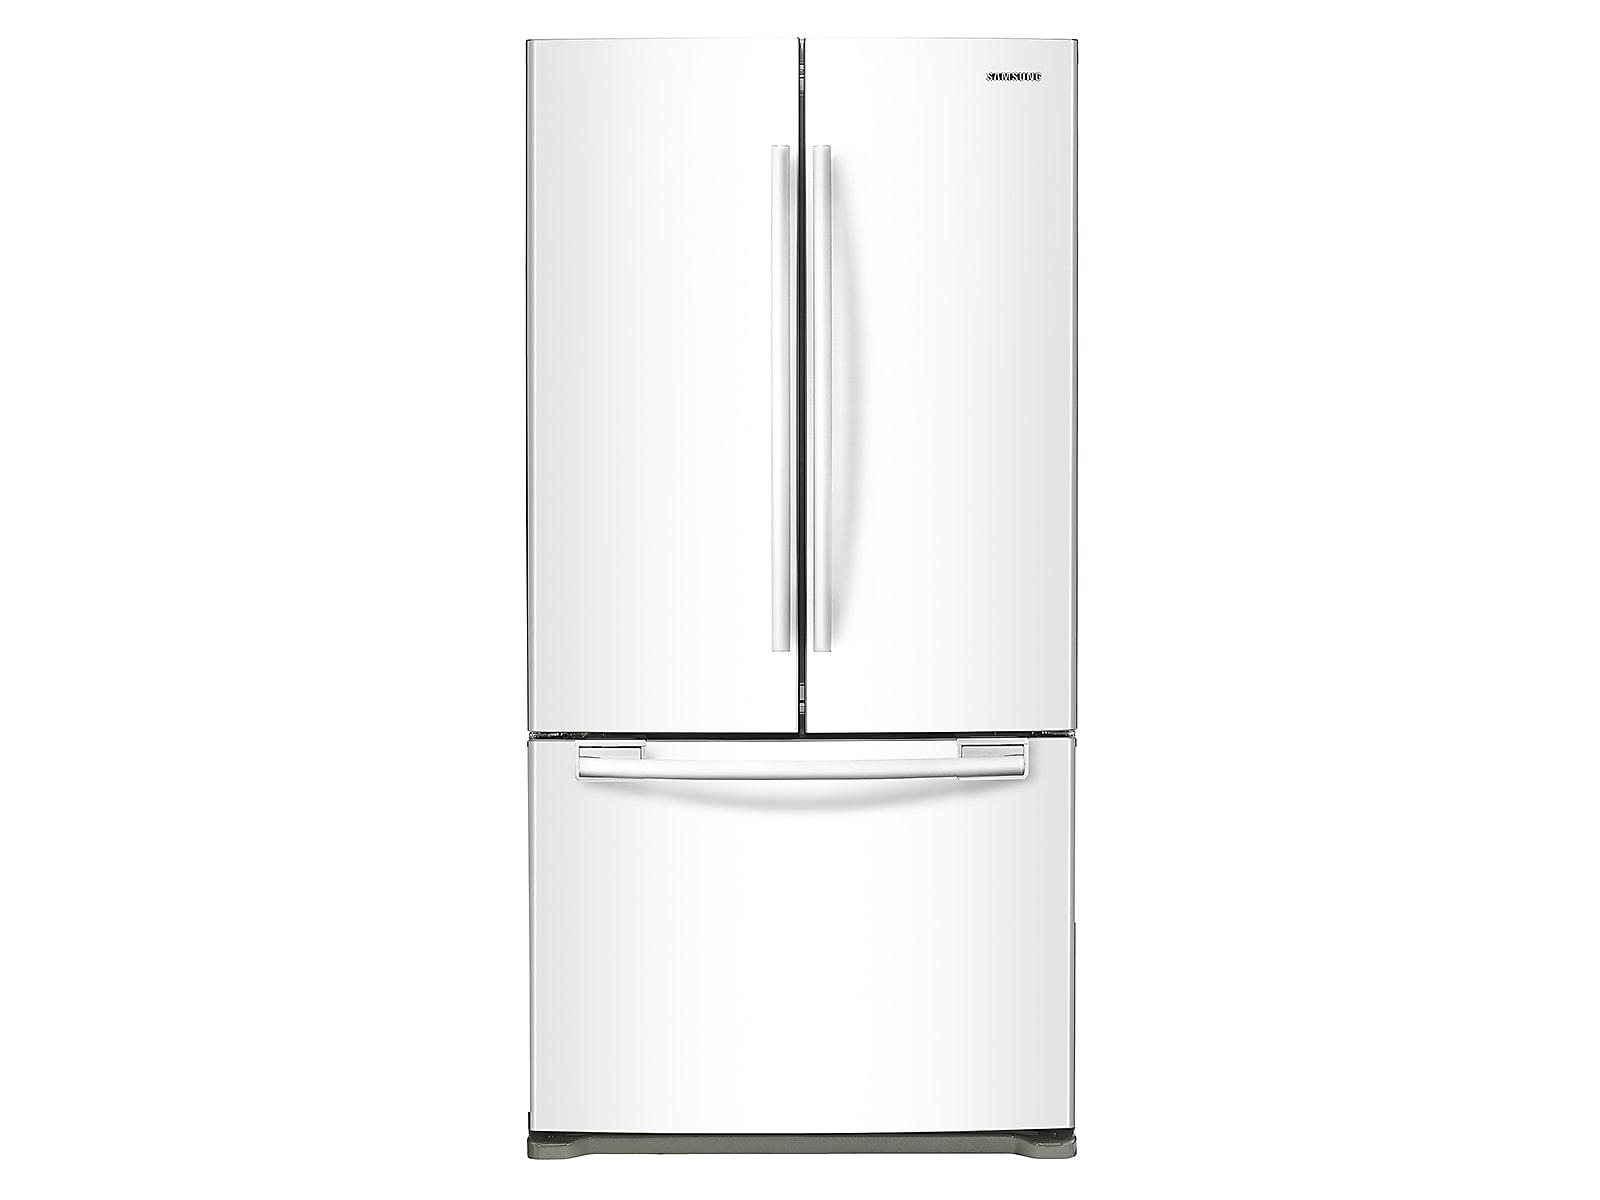 Samsung 20 cu. ft. French Door Refrigerator in White(RF20HFENBWW/US)